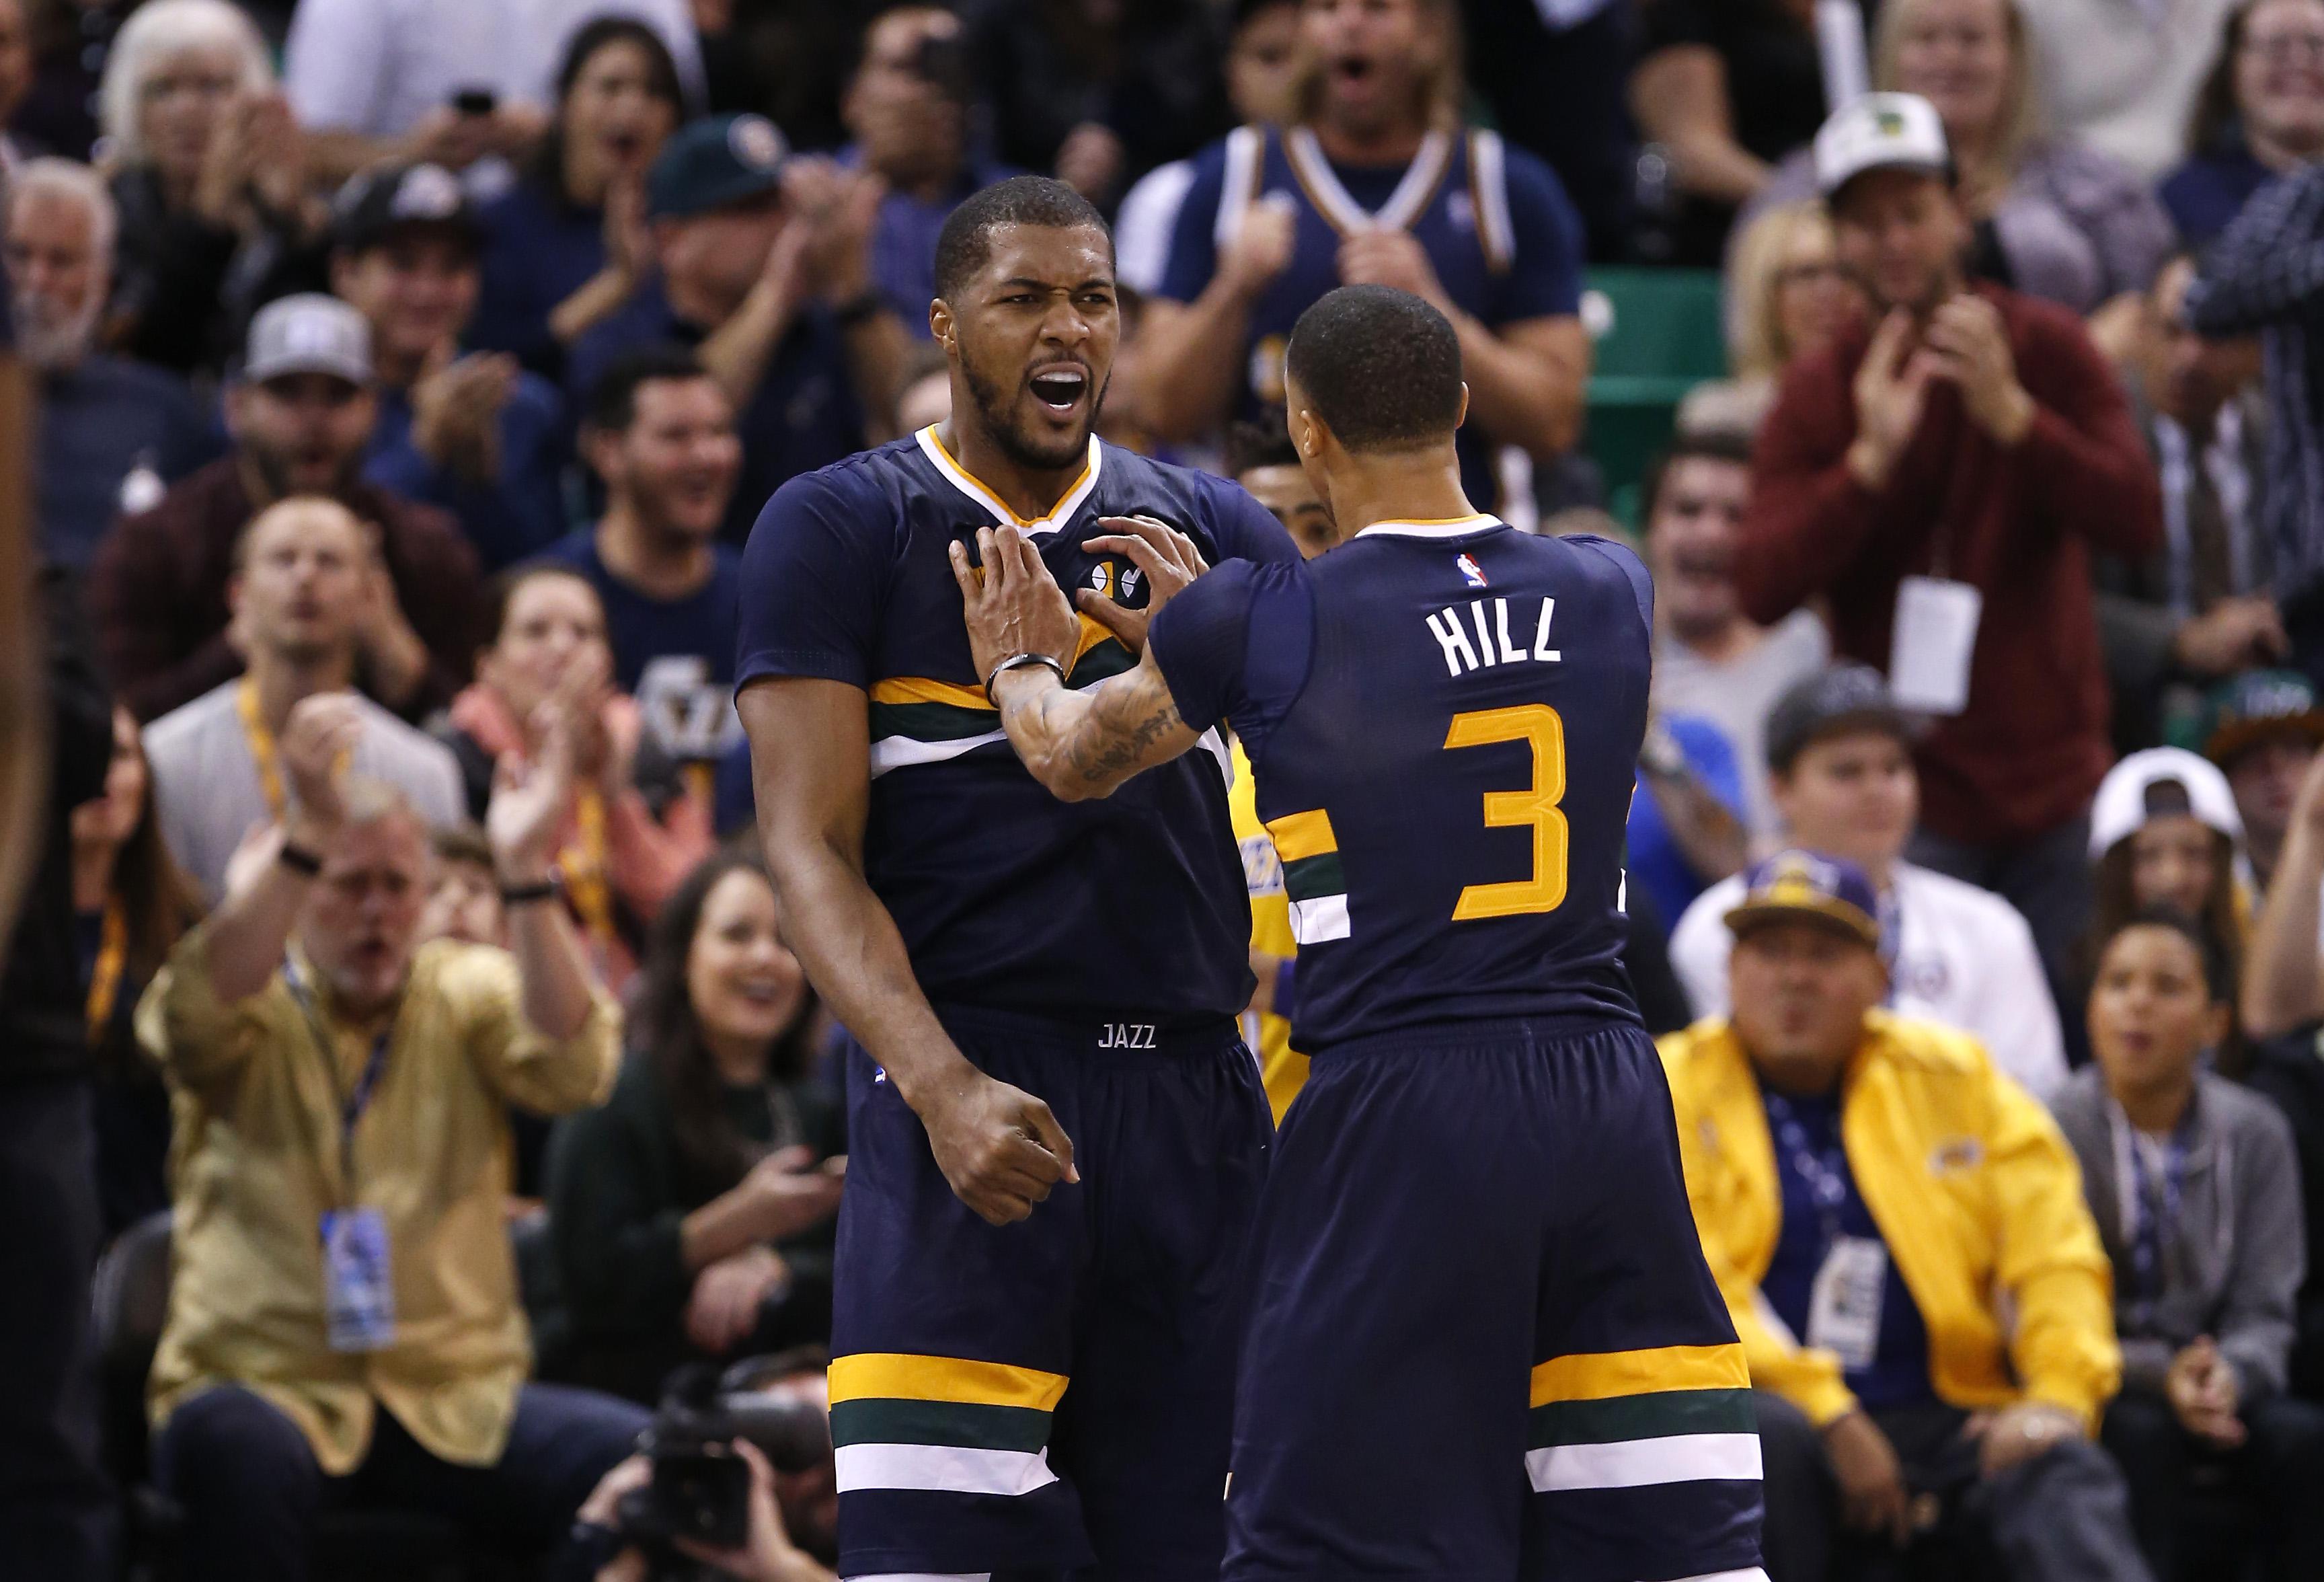 ... NBA Los Angeles Lakers at Utah Jazz adidas Derrick Favors Utah Jazz  Youth Boys Navy Blue Replica Jersey ... c585d8121